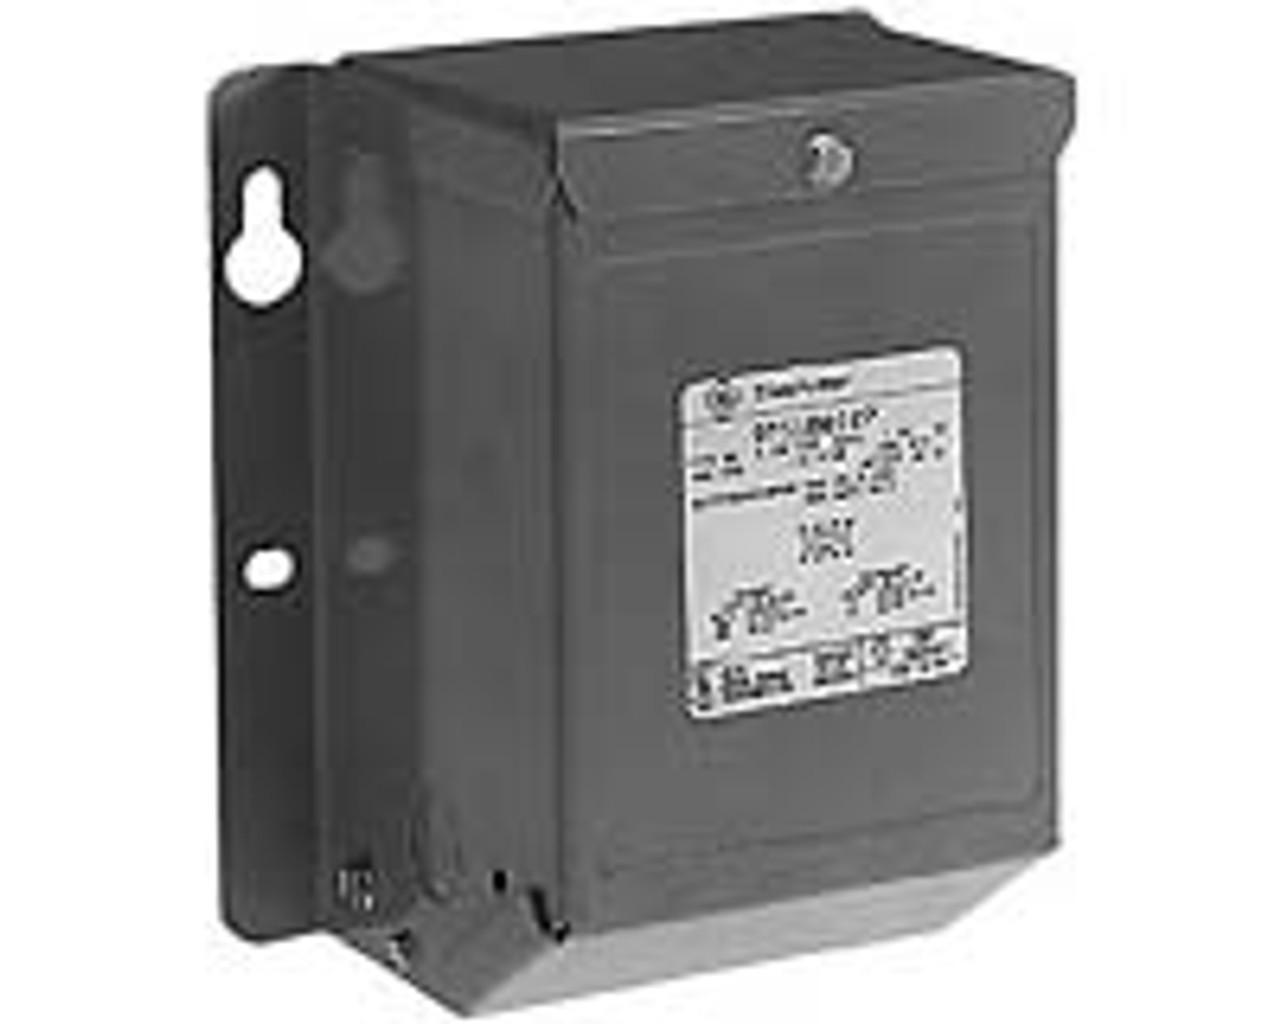 GE 9T51B0204 - 0.1 KVA 240x480 TO 24/48 VOLTS 1PH TRANSFORMER - New